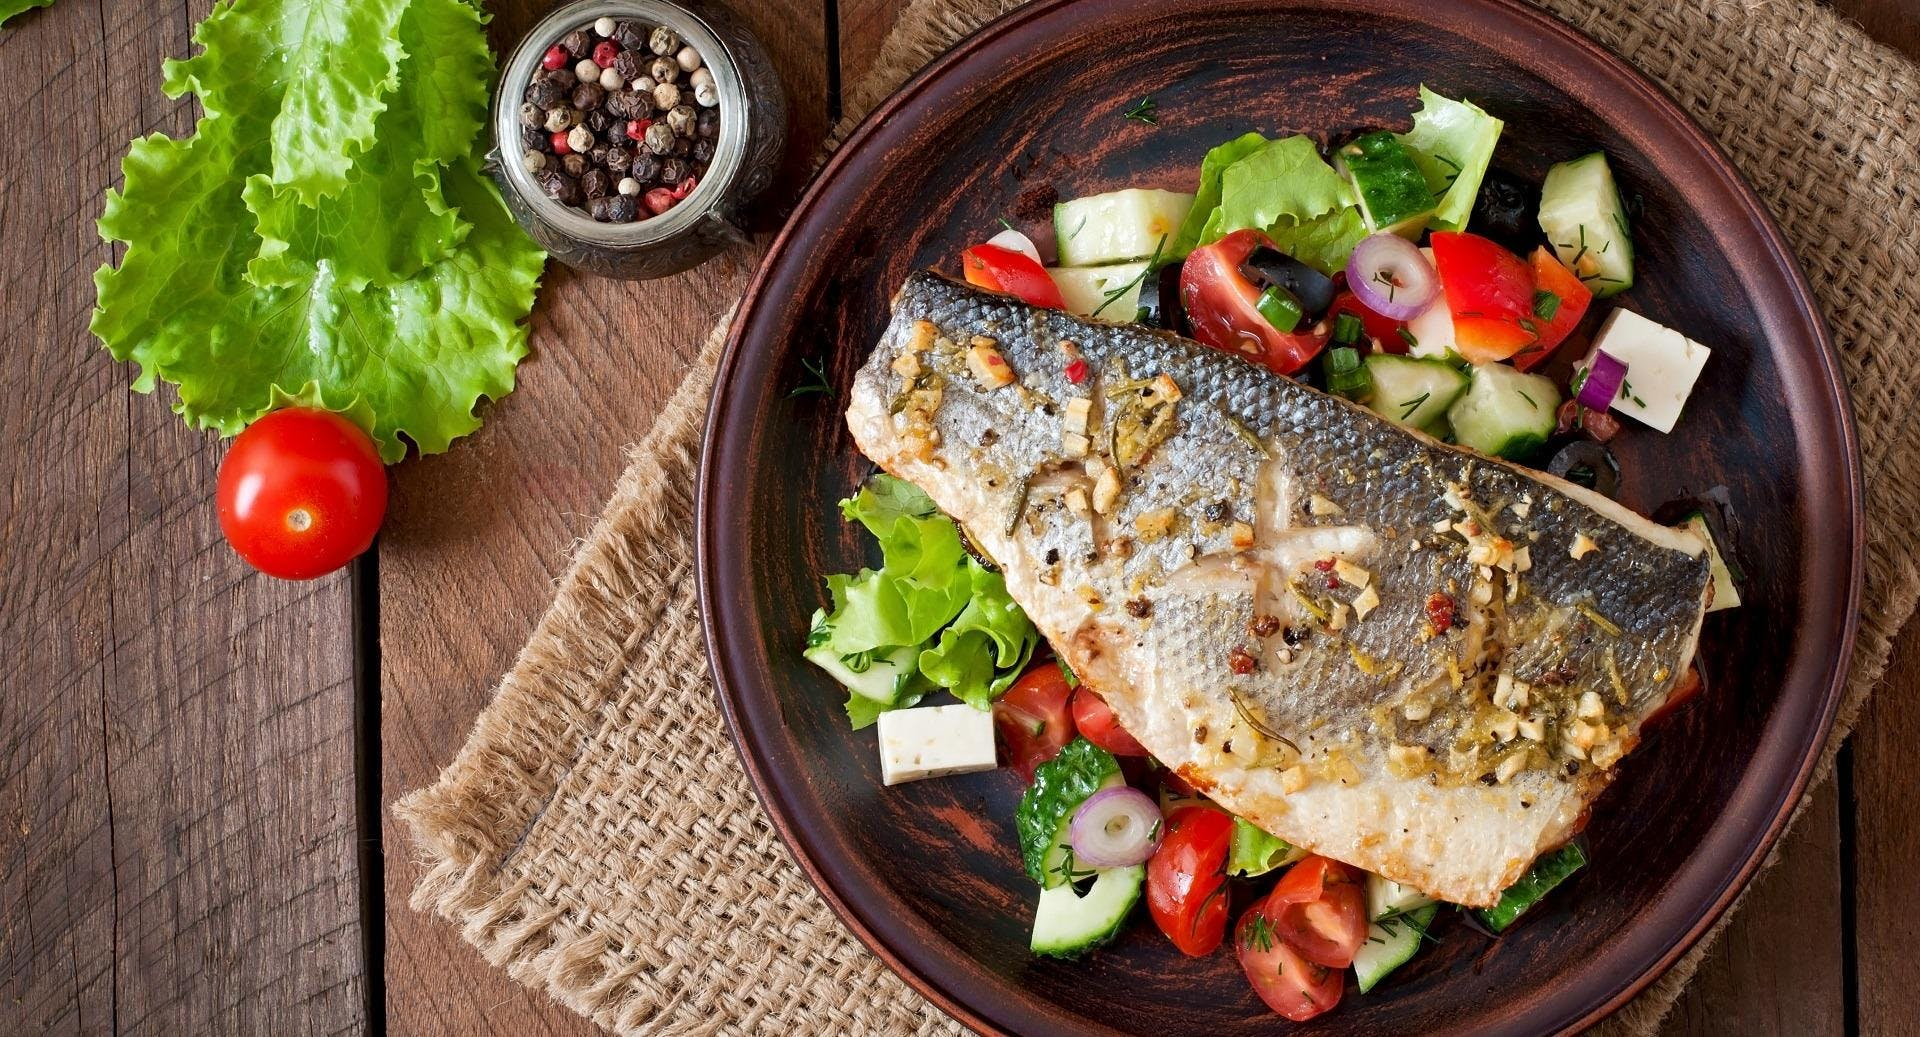 Fischwirt im Urmeer